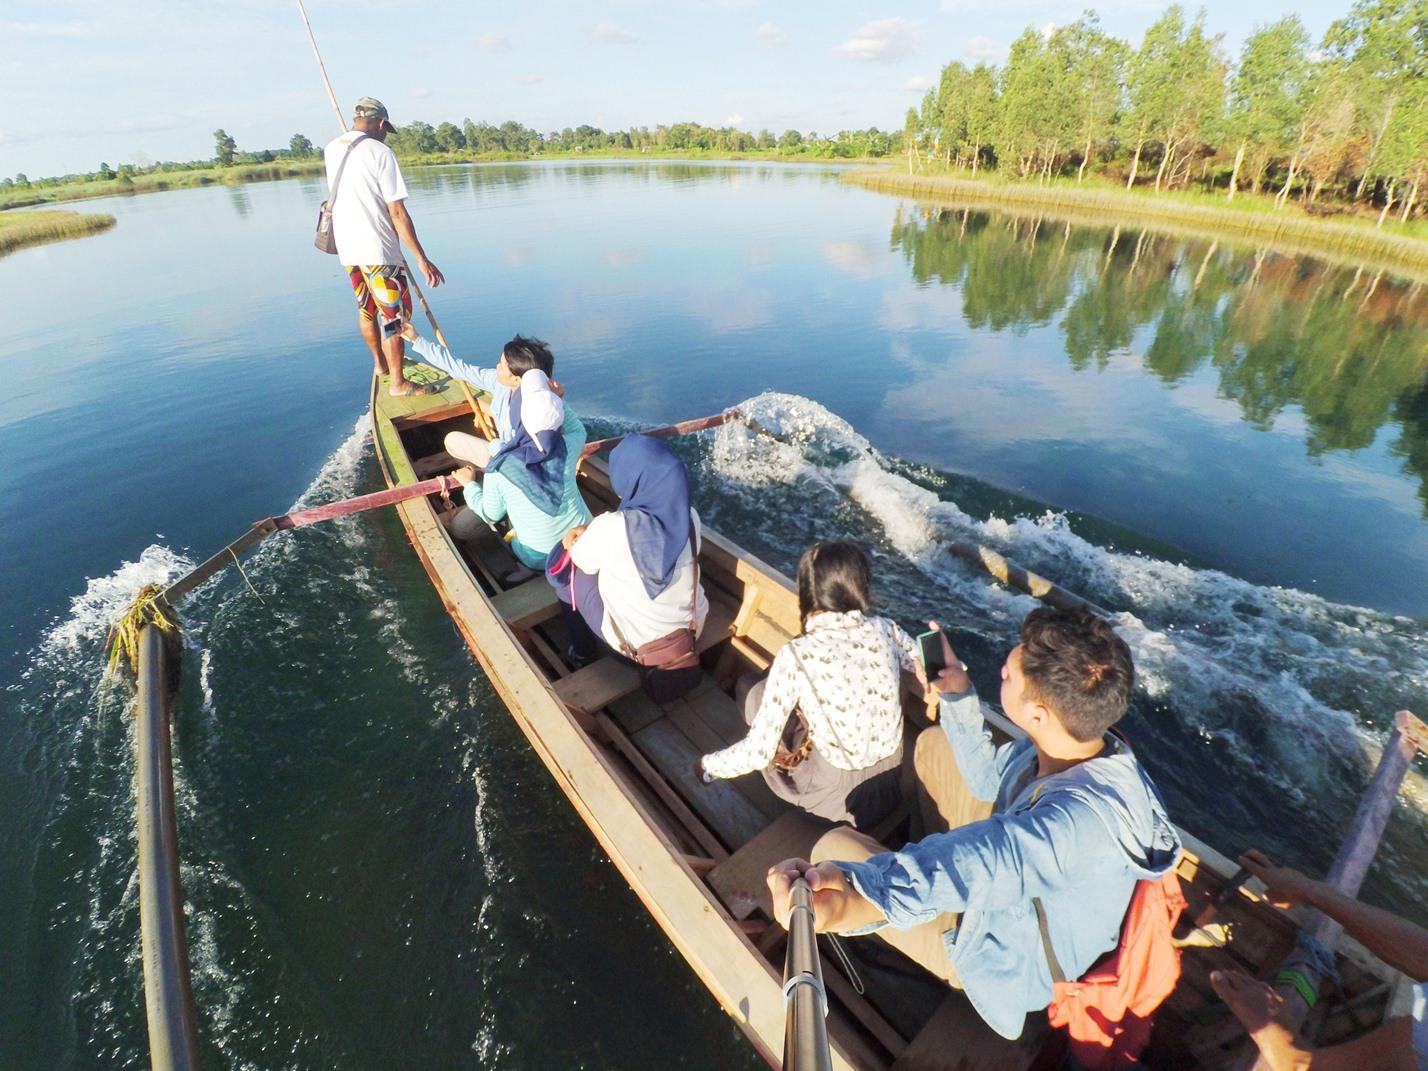 sumber foto http://zainalhakimmsc.blogspot.co.id/2016/07/beklotokan-di-danau-seran.html